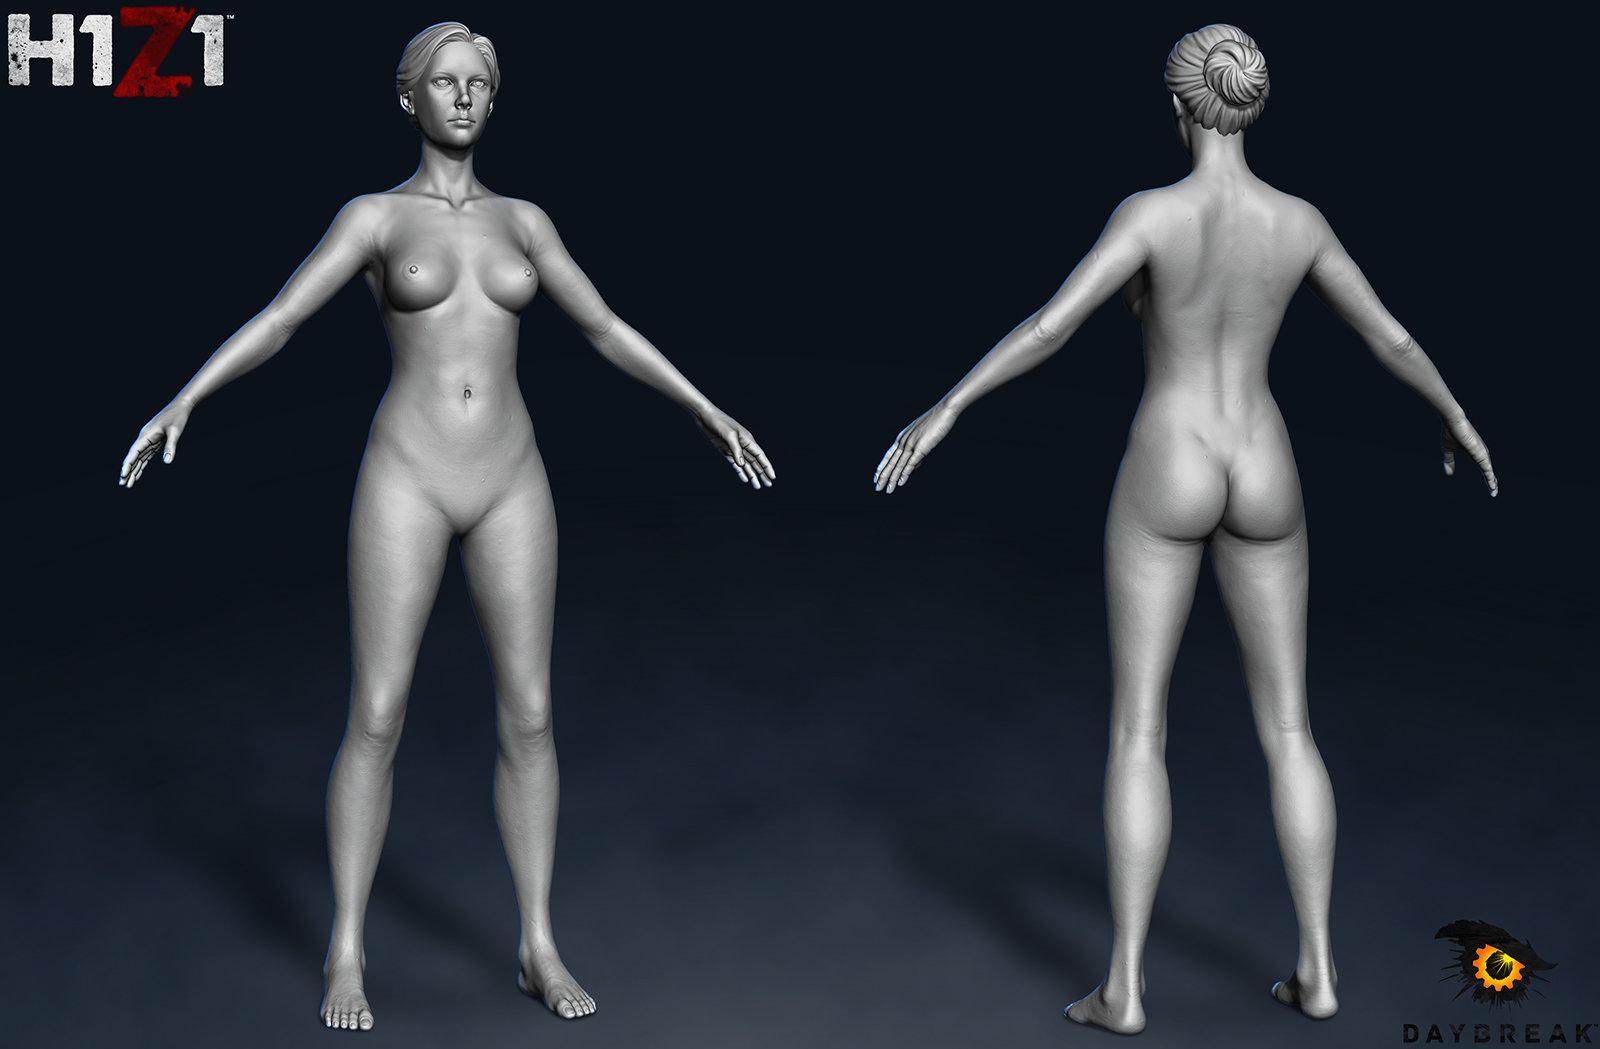 satoshi-arakawa-female-nude.jpg?1430239577